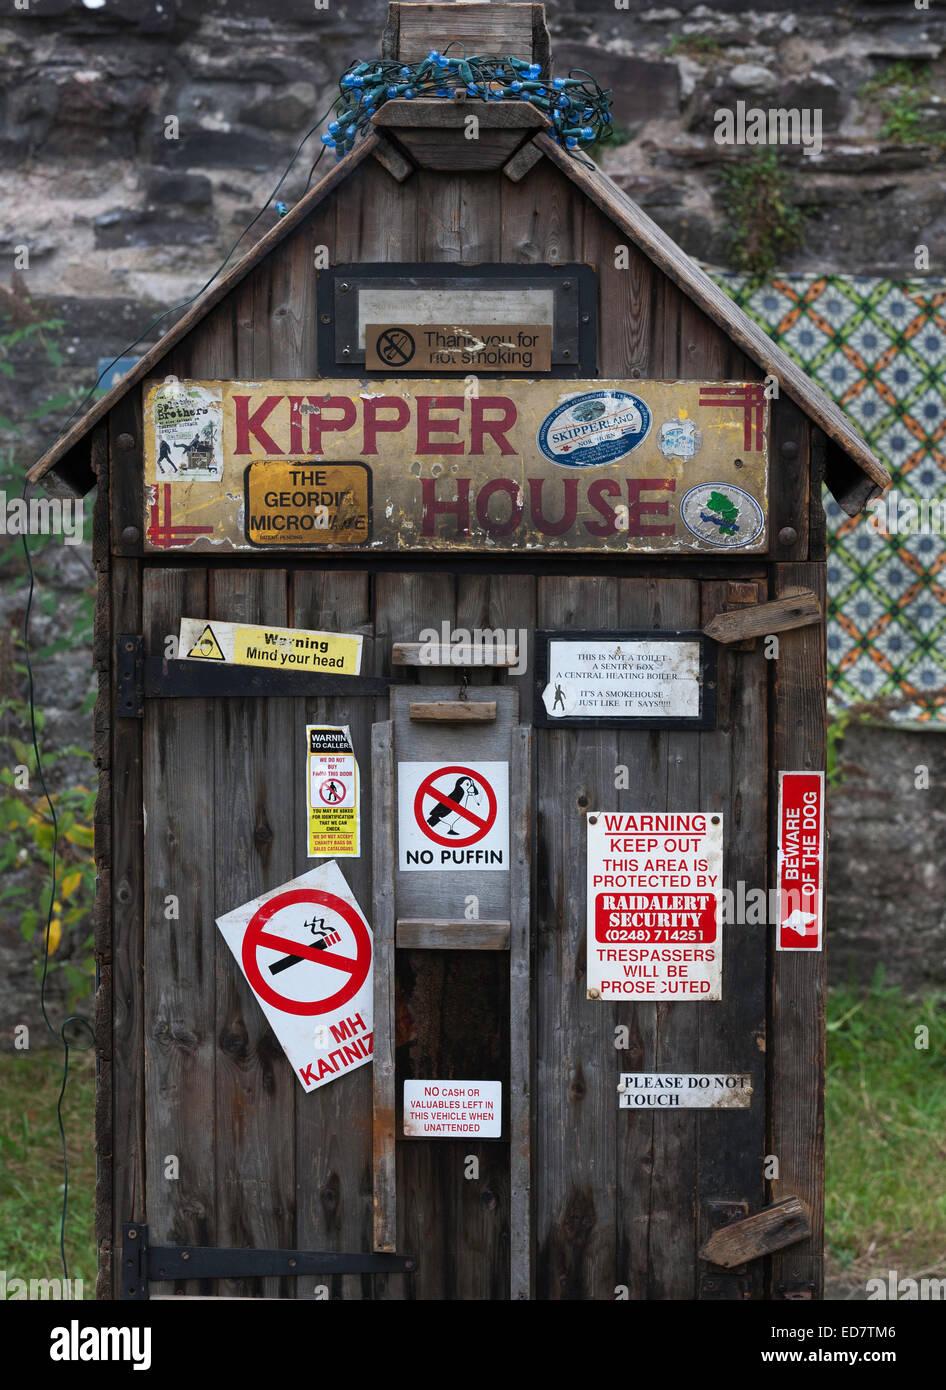 Kipper House smokery Abergavenny Food Festival - Stock Image